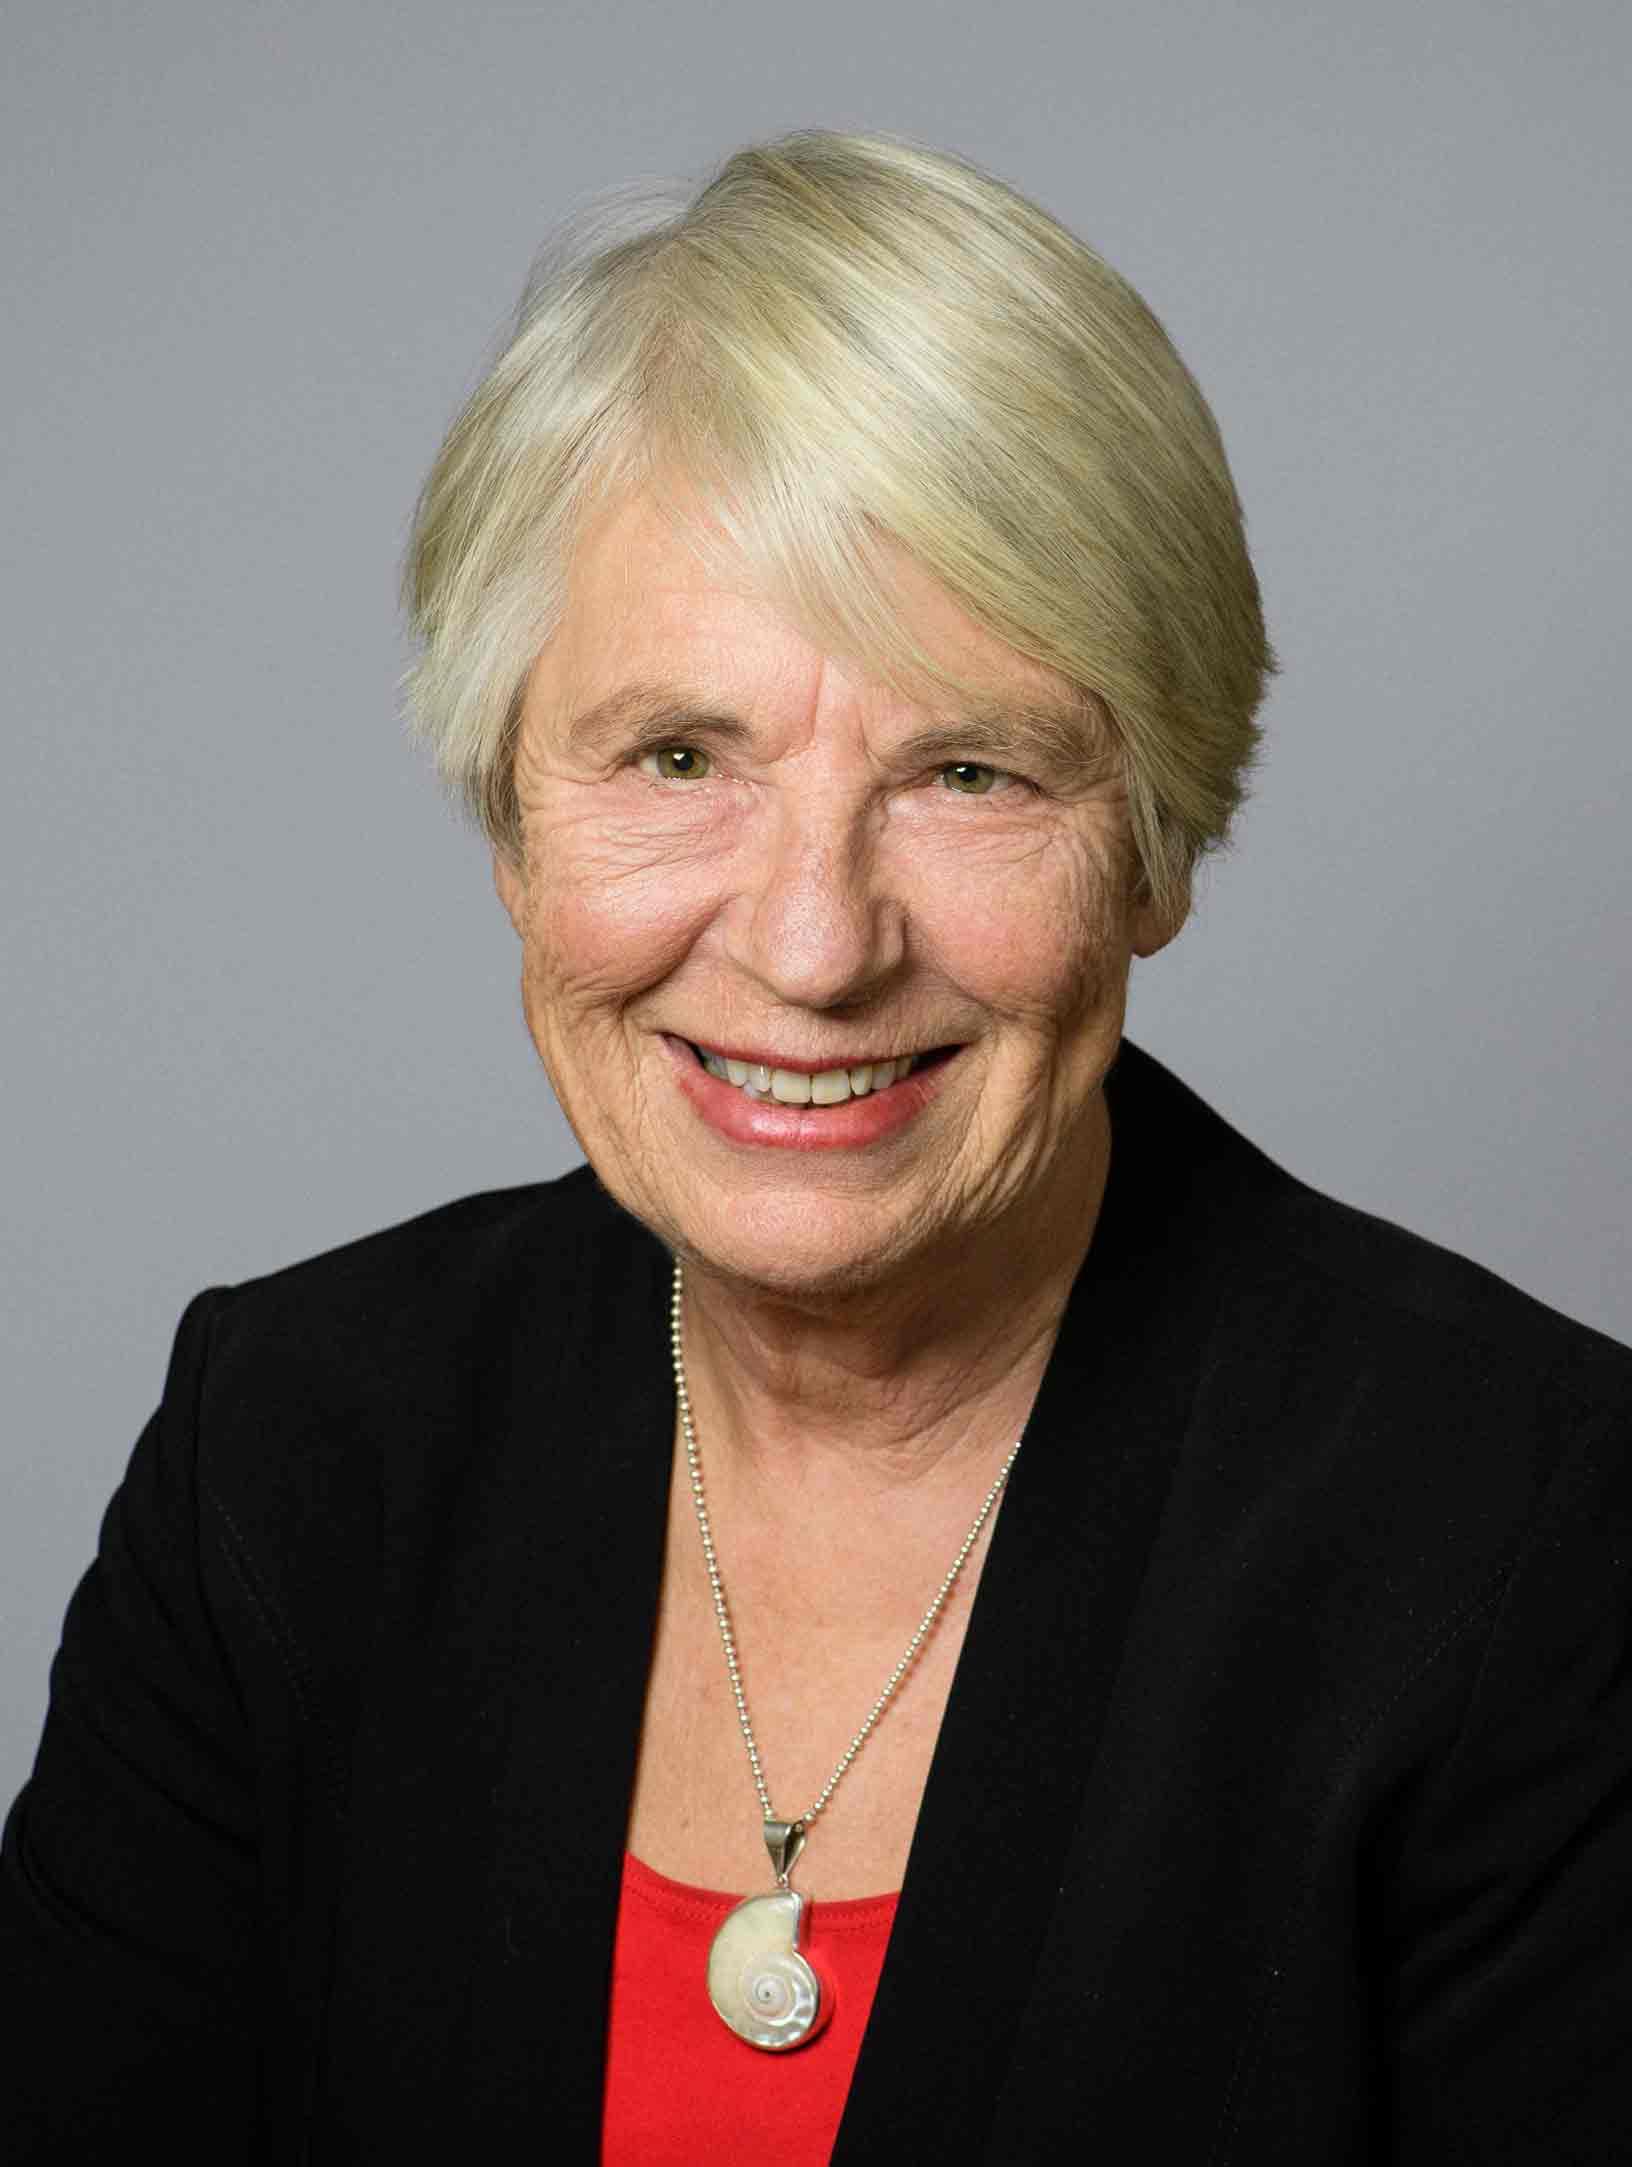 Cheryl R. Lean